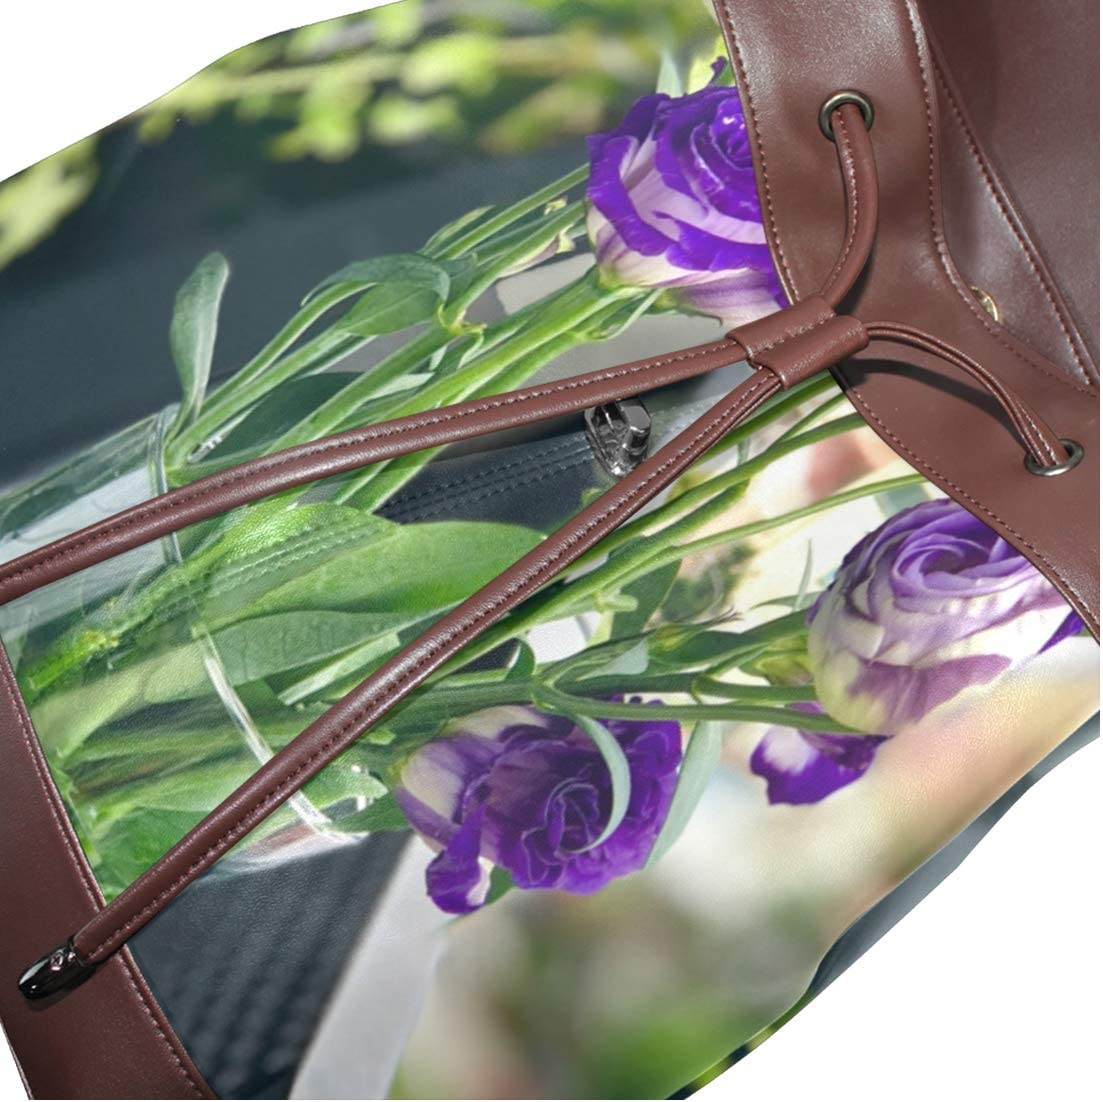 Storage Bag For Men Women Girls Boys Personalized Pattern Purple Flower Travel Bag Shopping Bag 2 School Bag Backpack